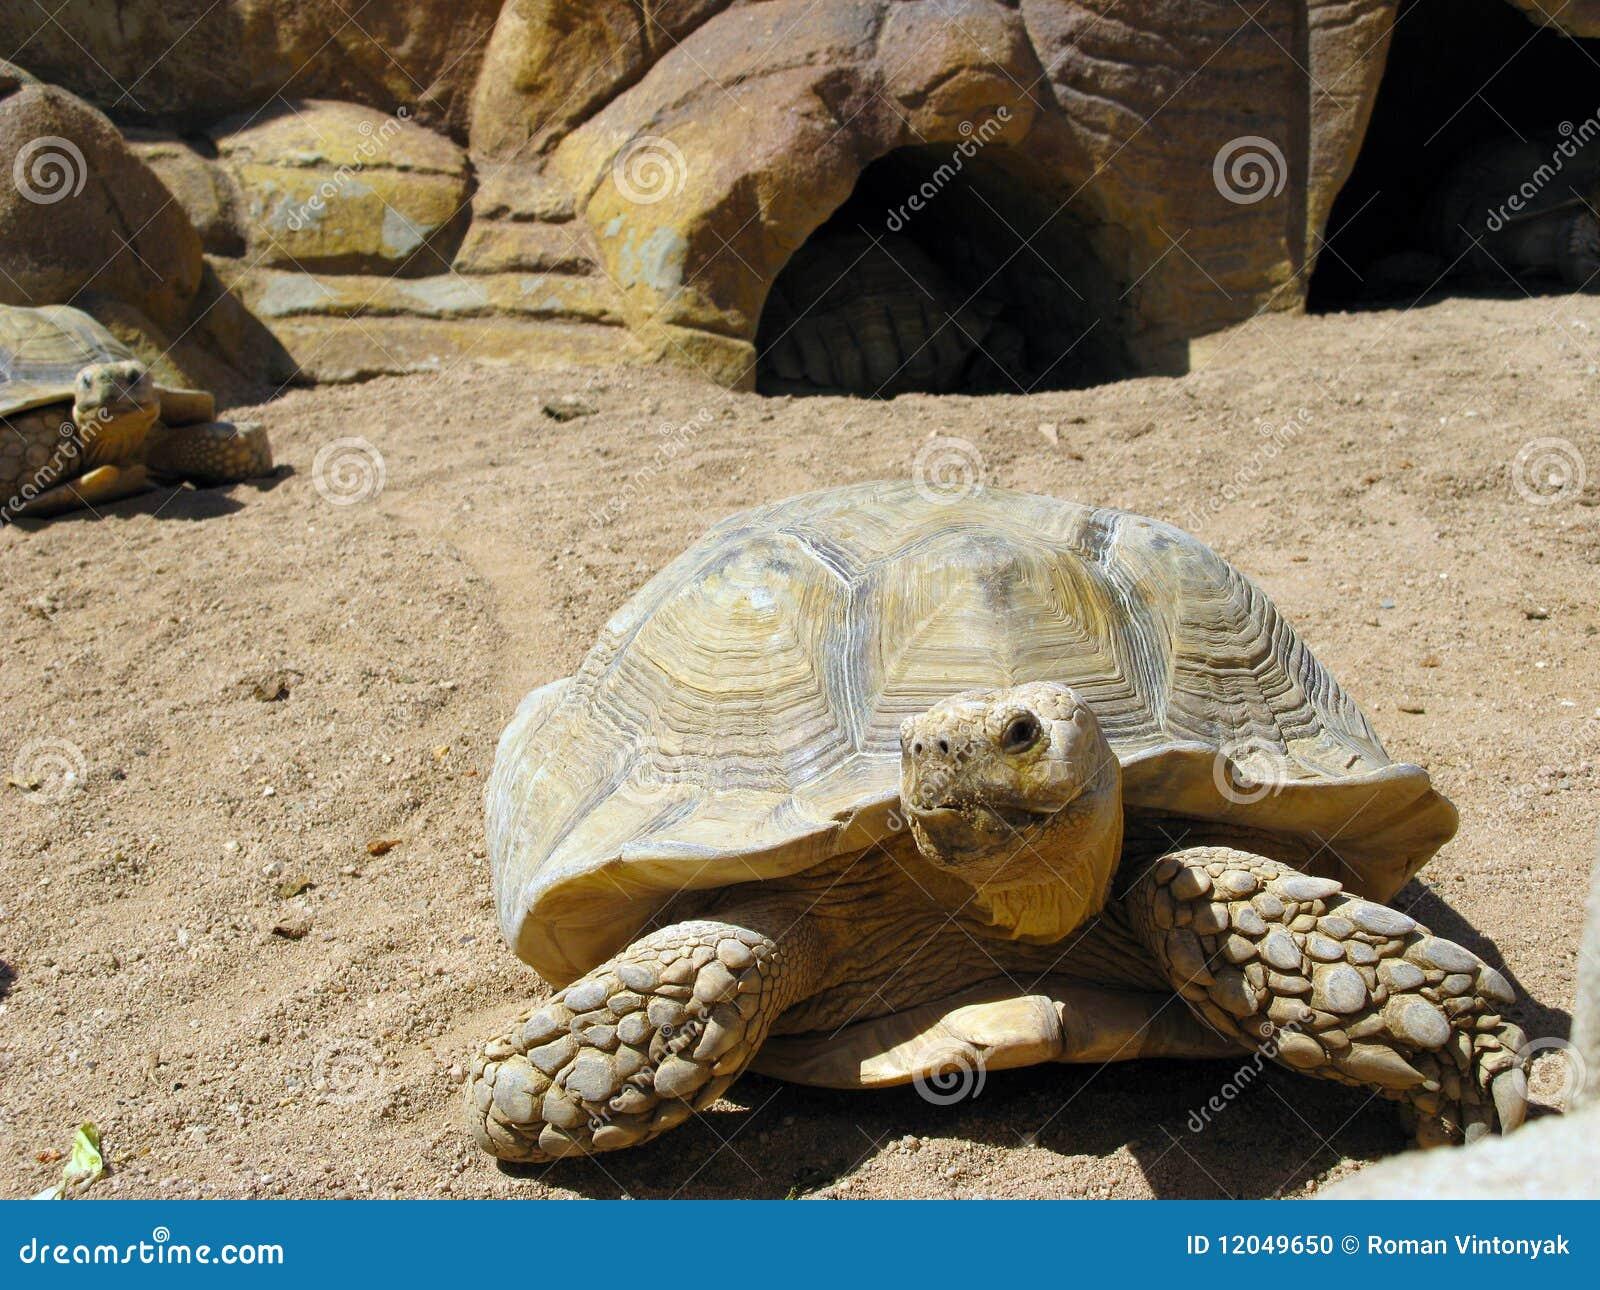 Turtle and desert